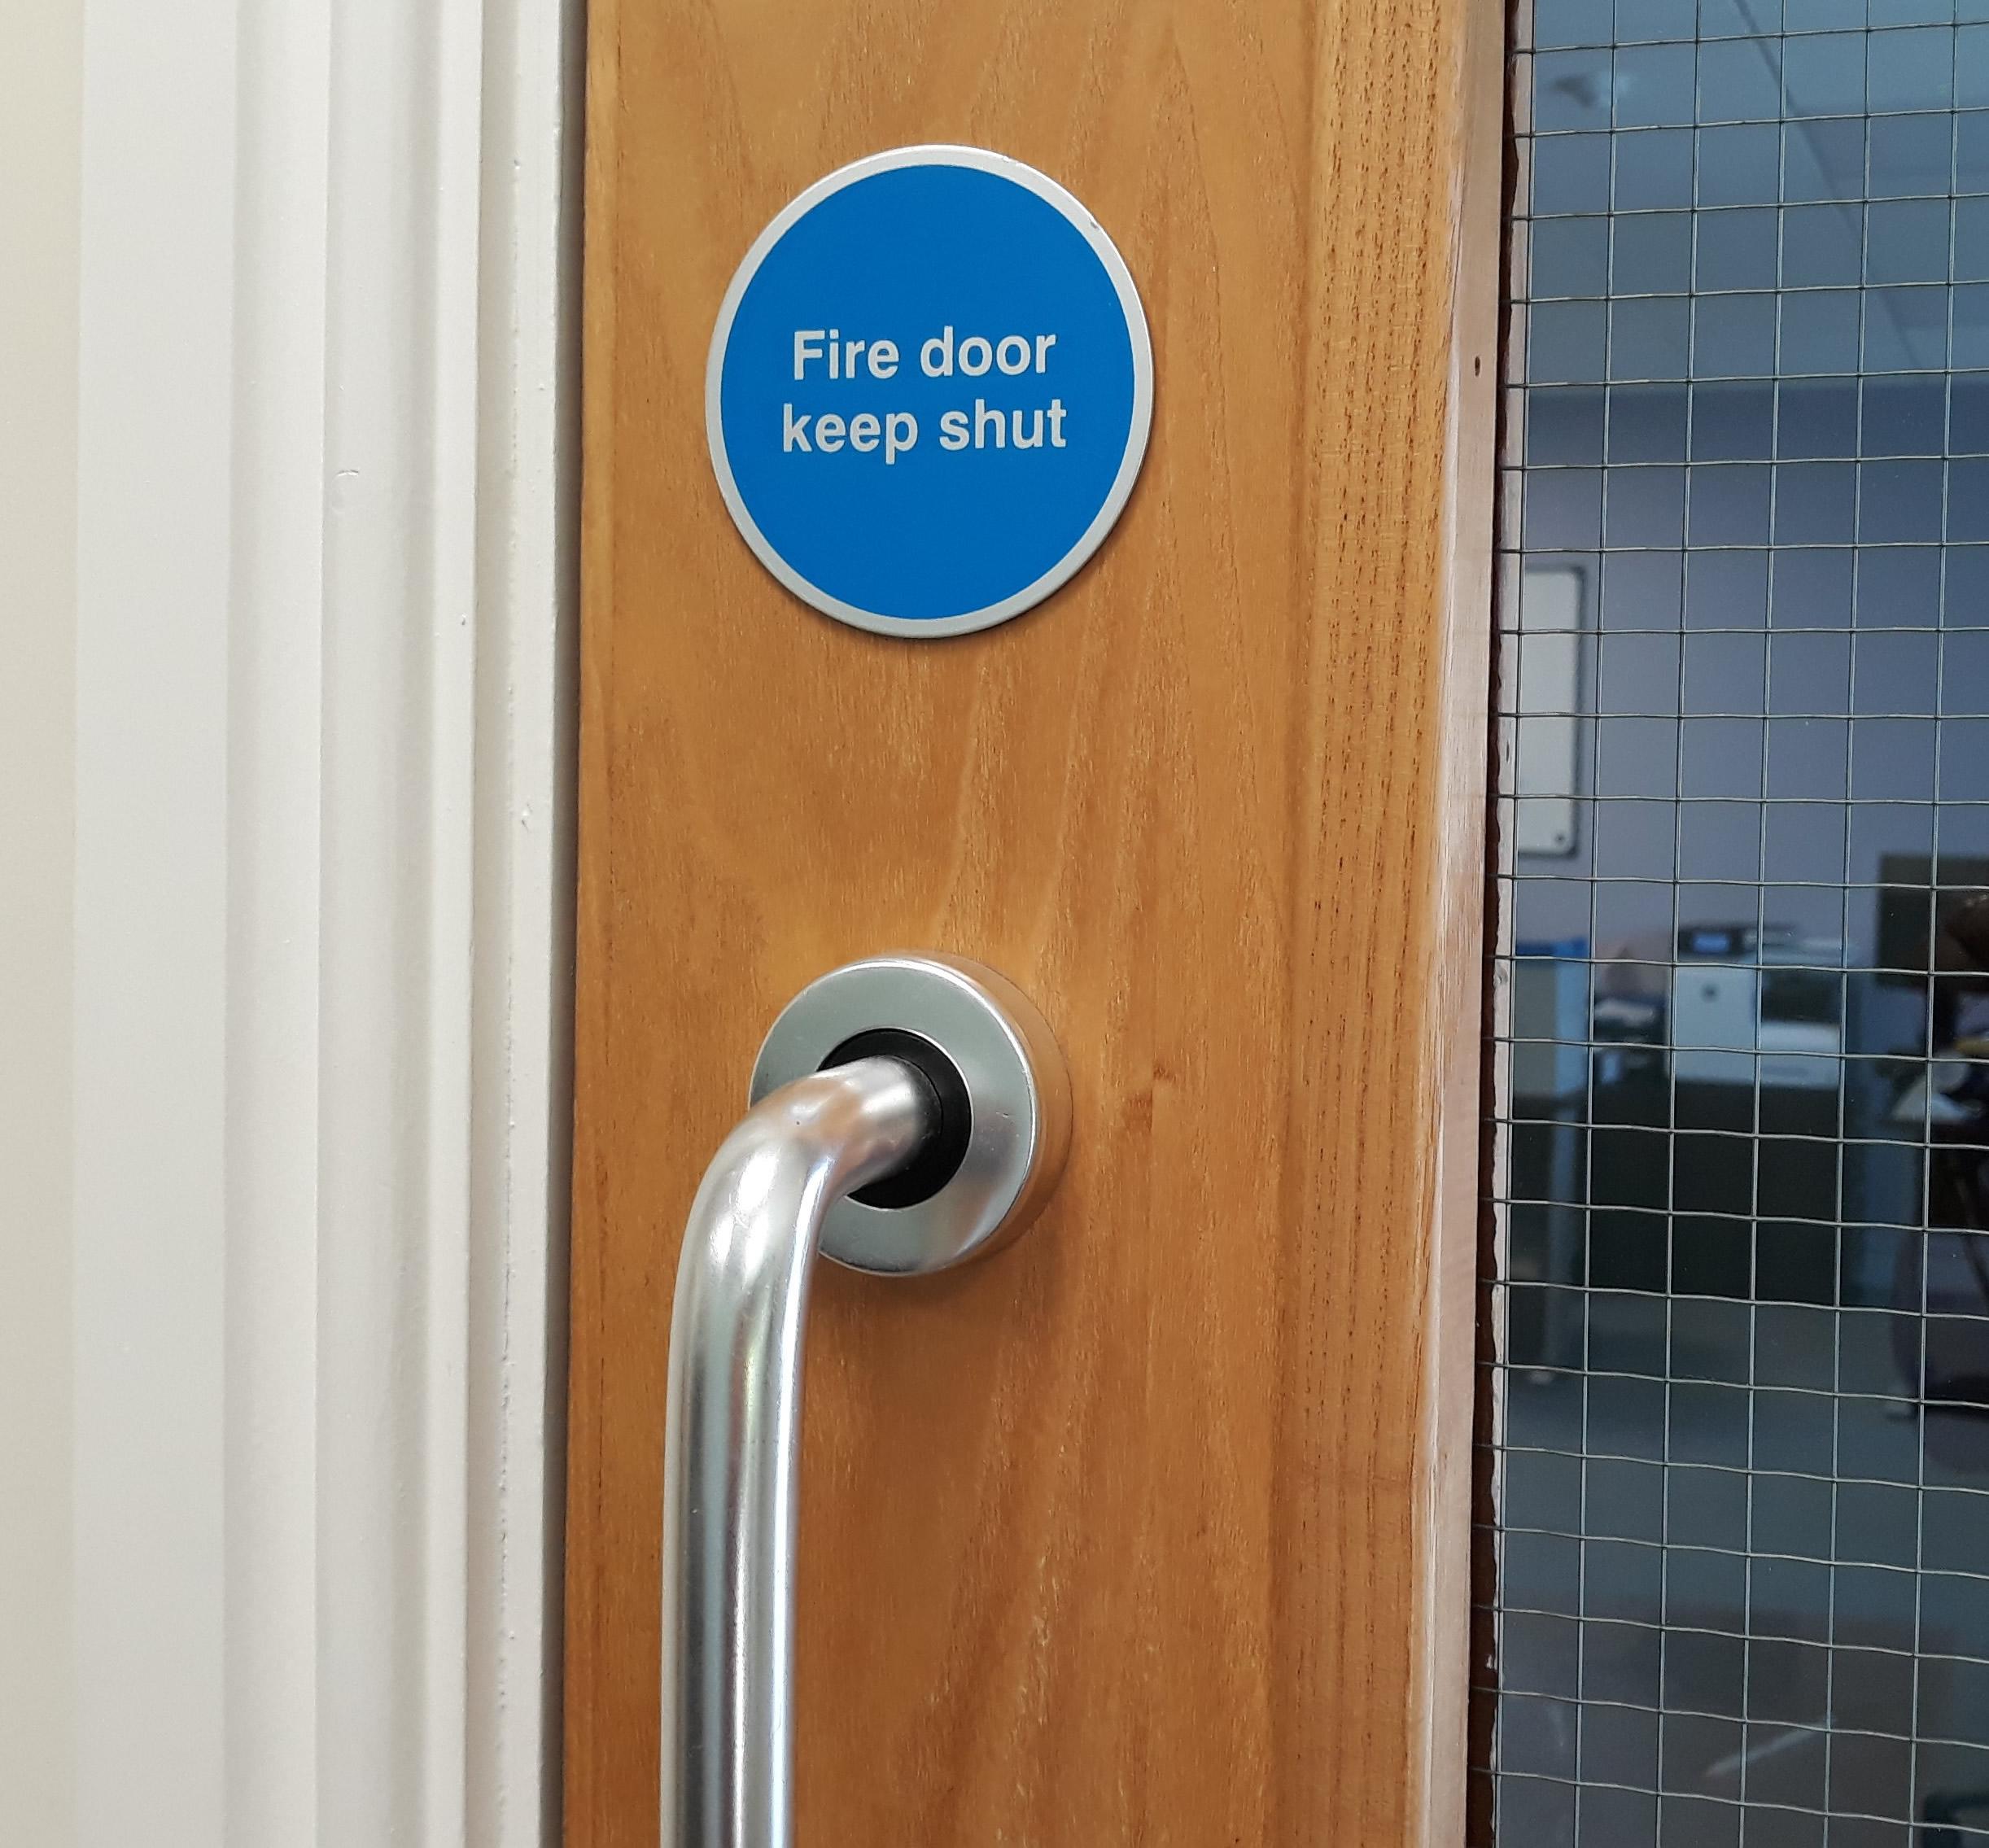 Gaps Underneath Fire Doors Safelincs Blog